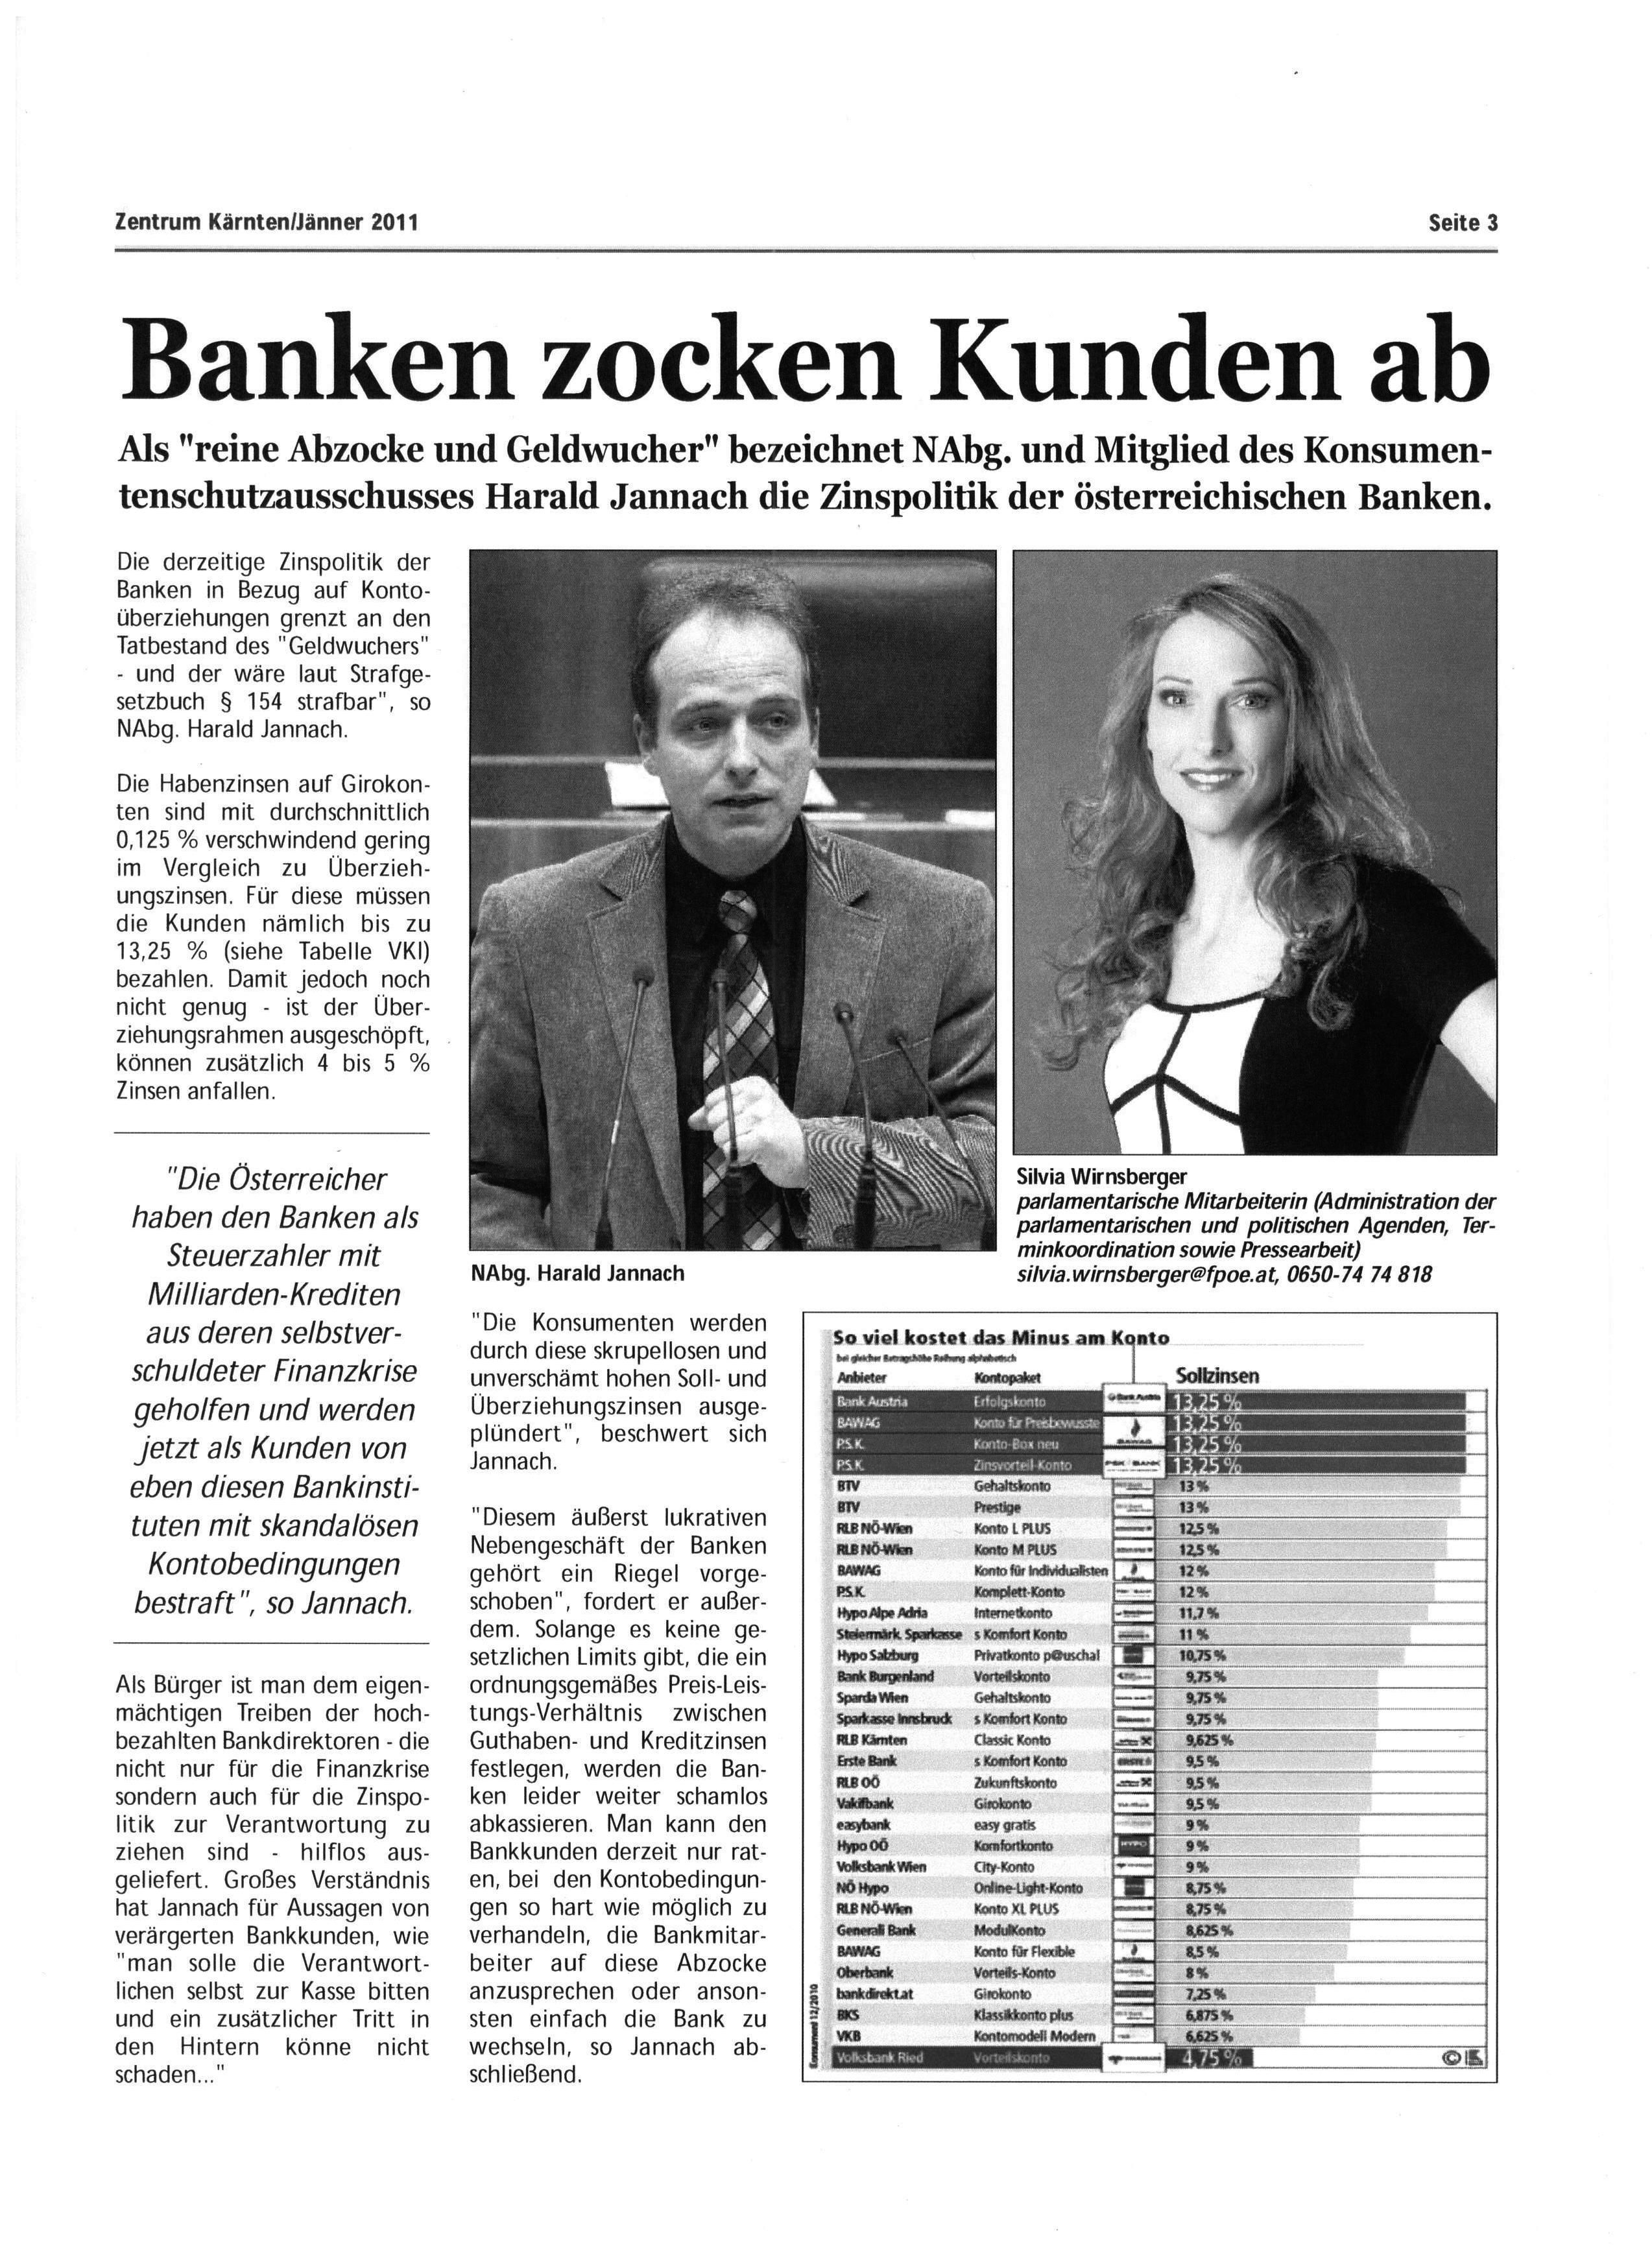 Banken zocken Kunden ab!